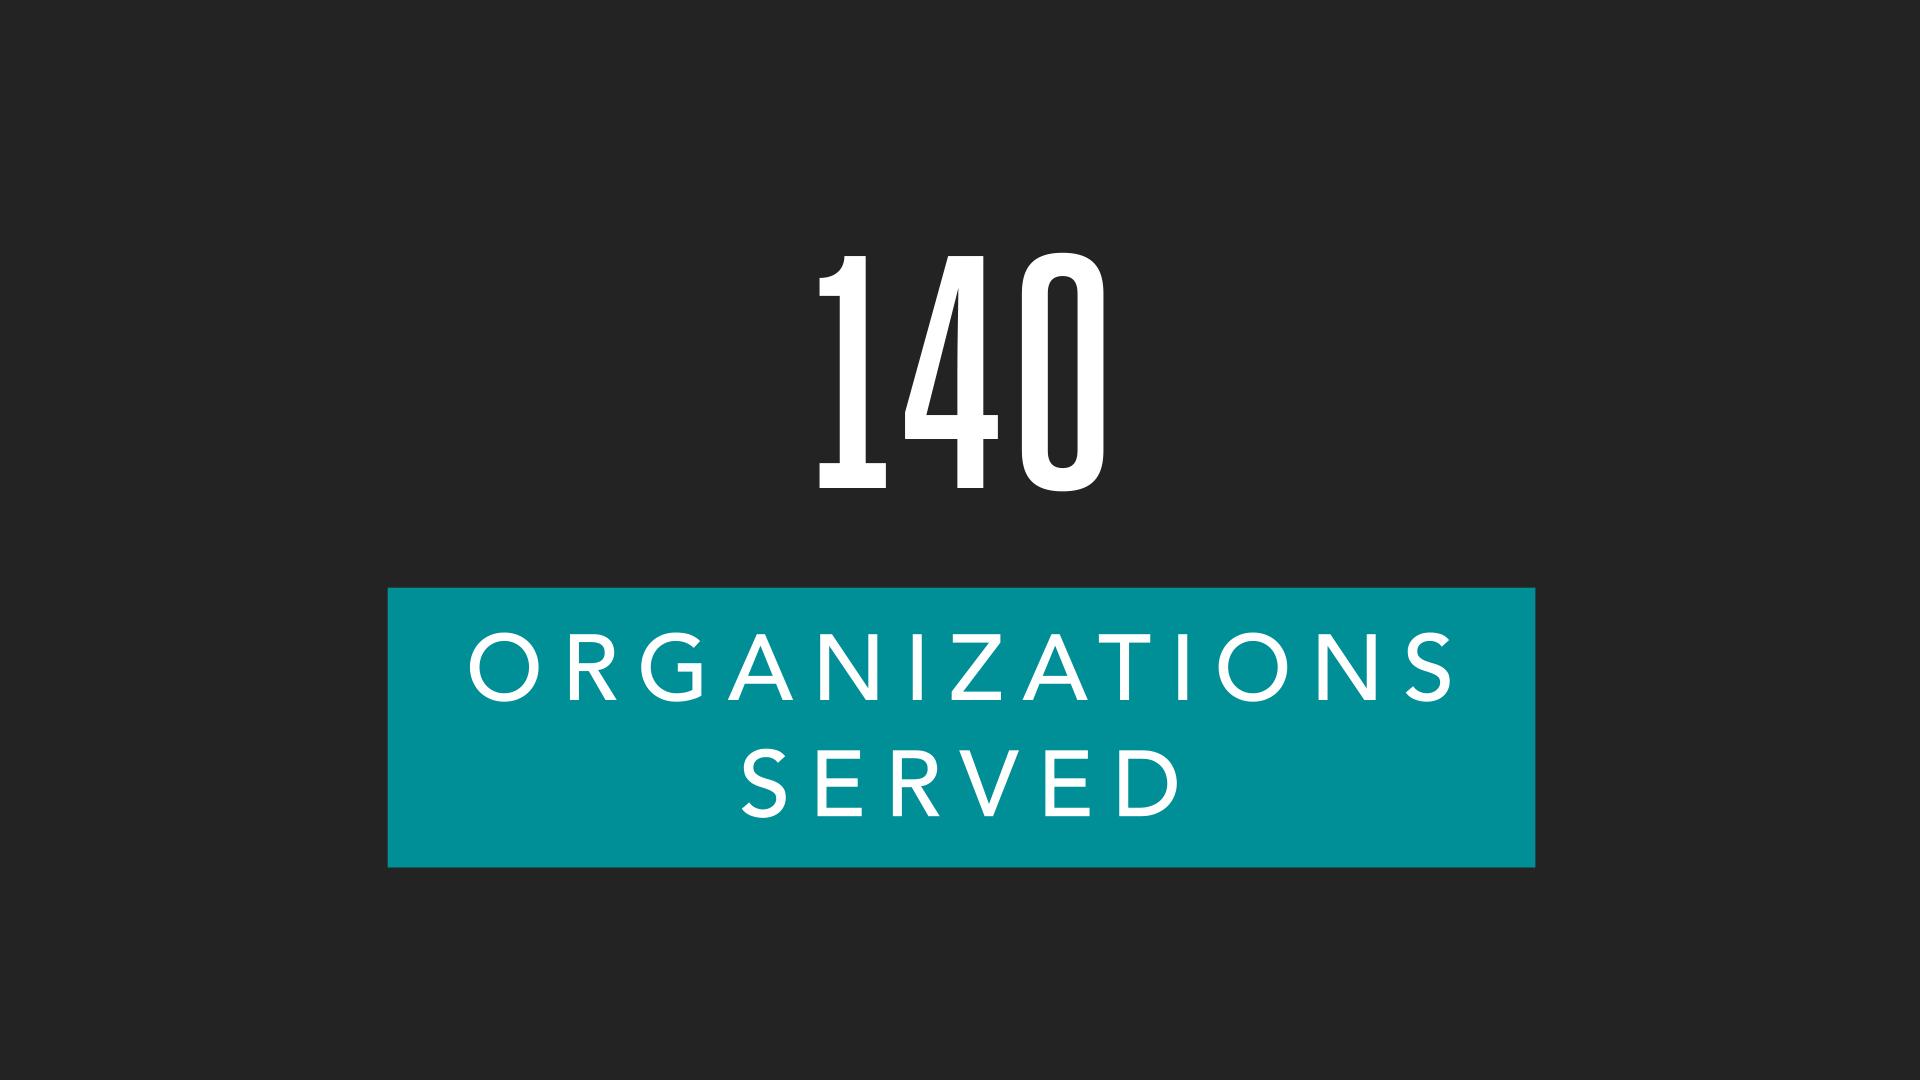 Food Relief Program - 140 Organizations Served